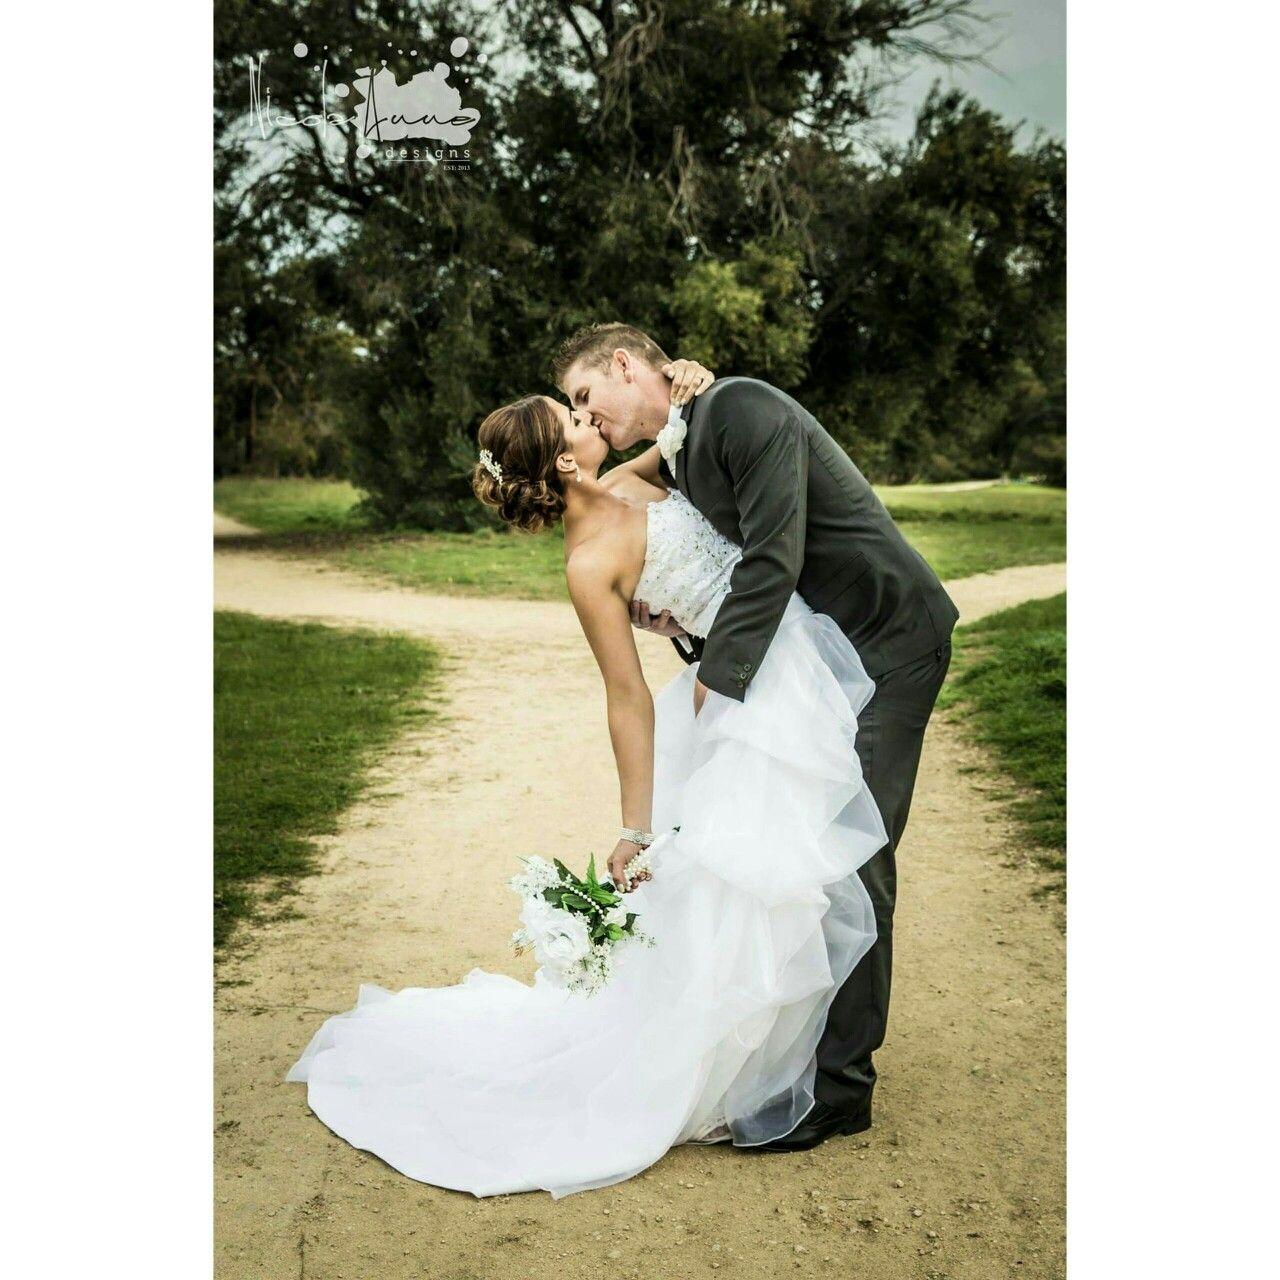 #wedding #perthphotography #nicolaannedesigns www.nicolaannedesigns.com.au